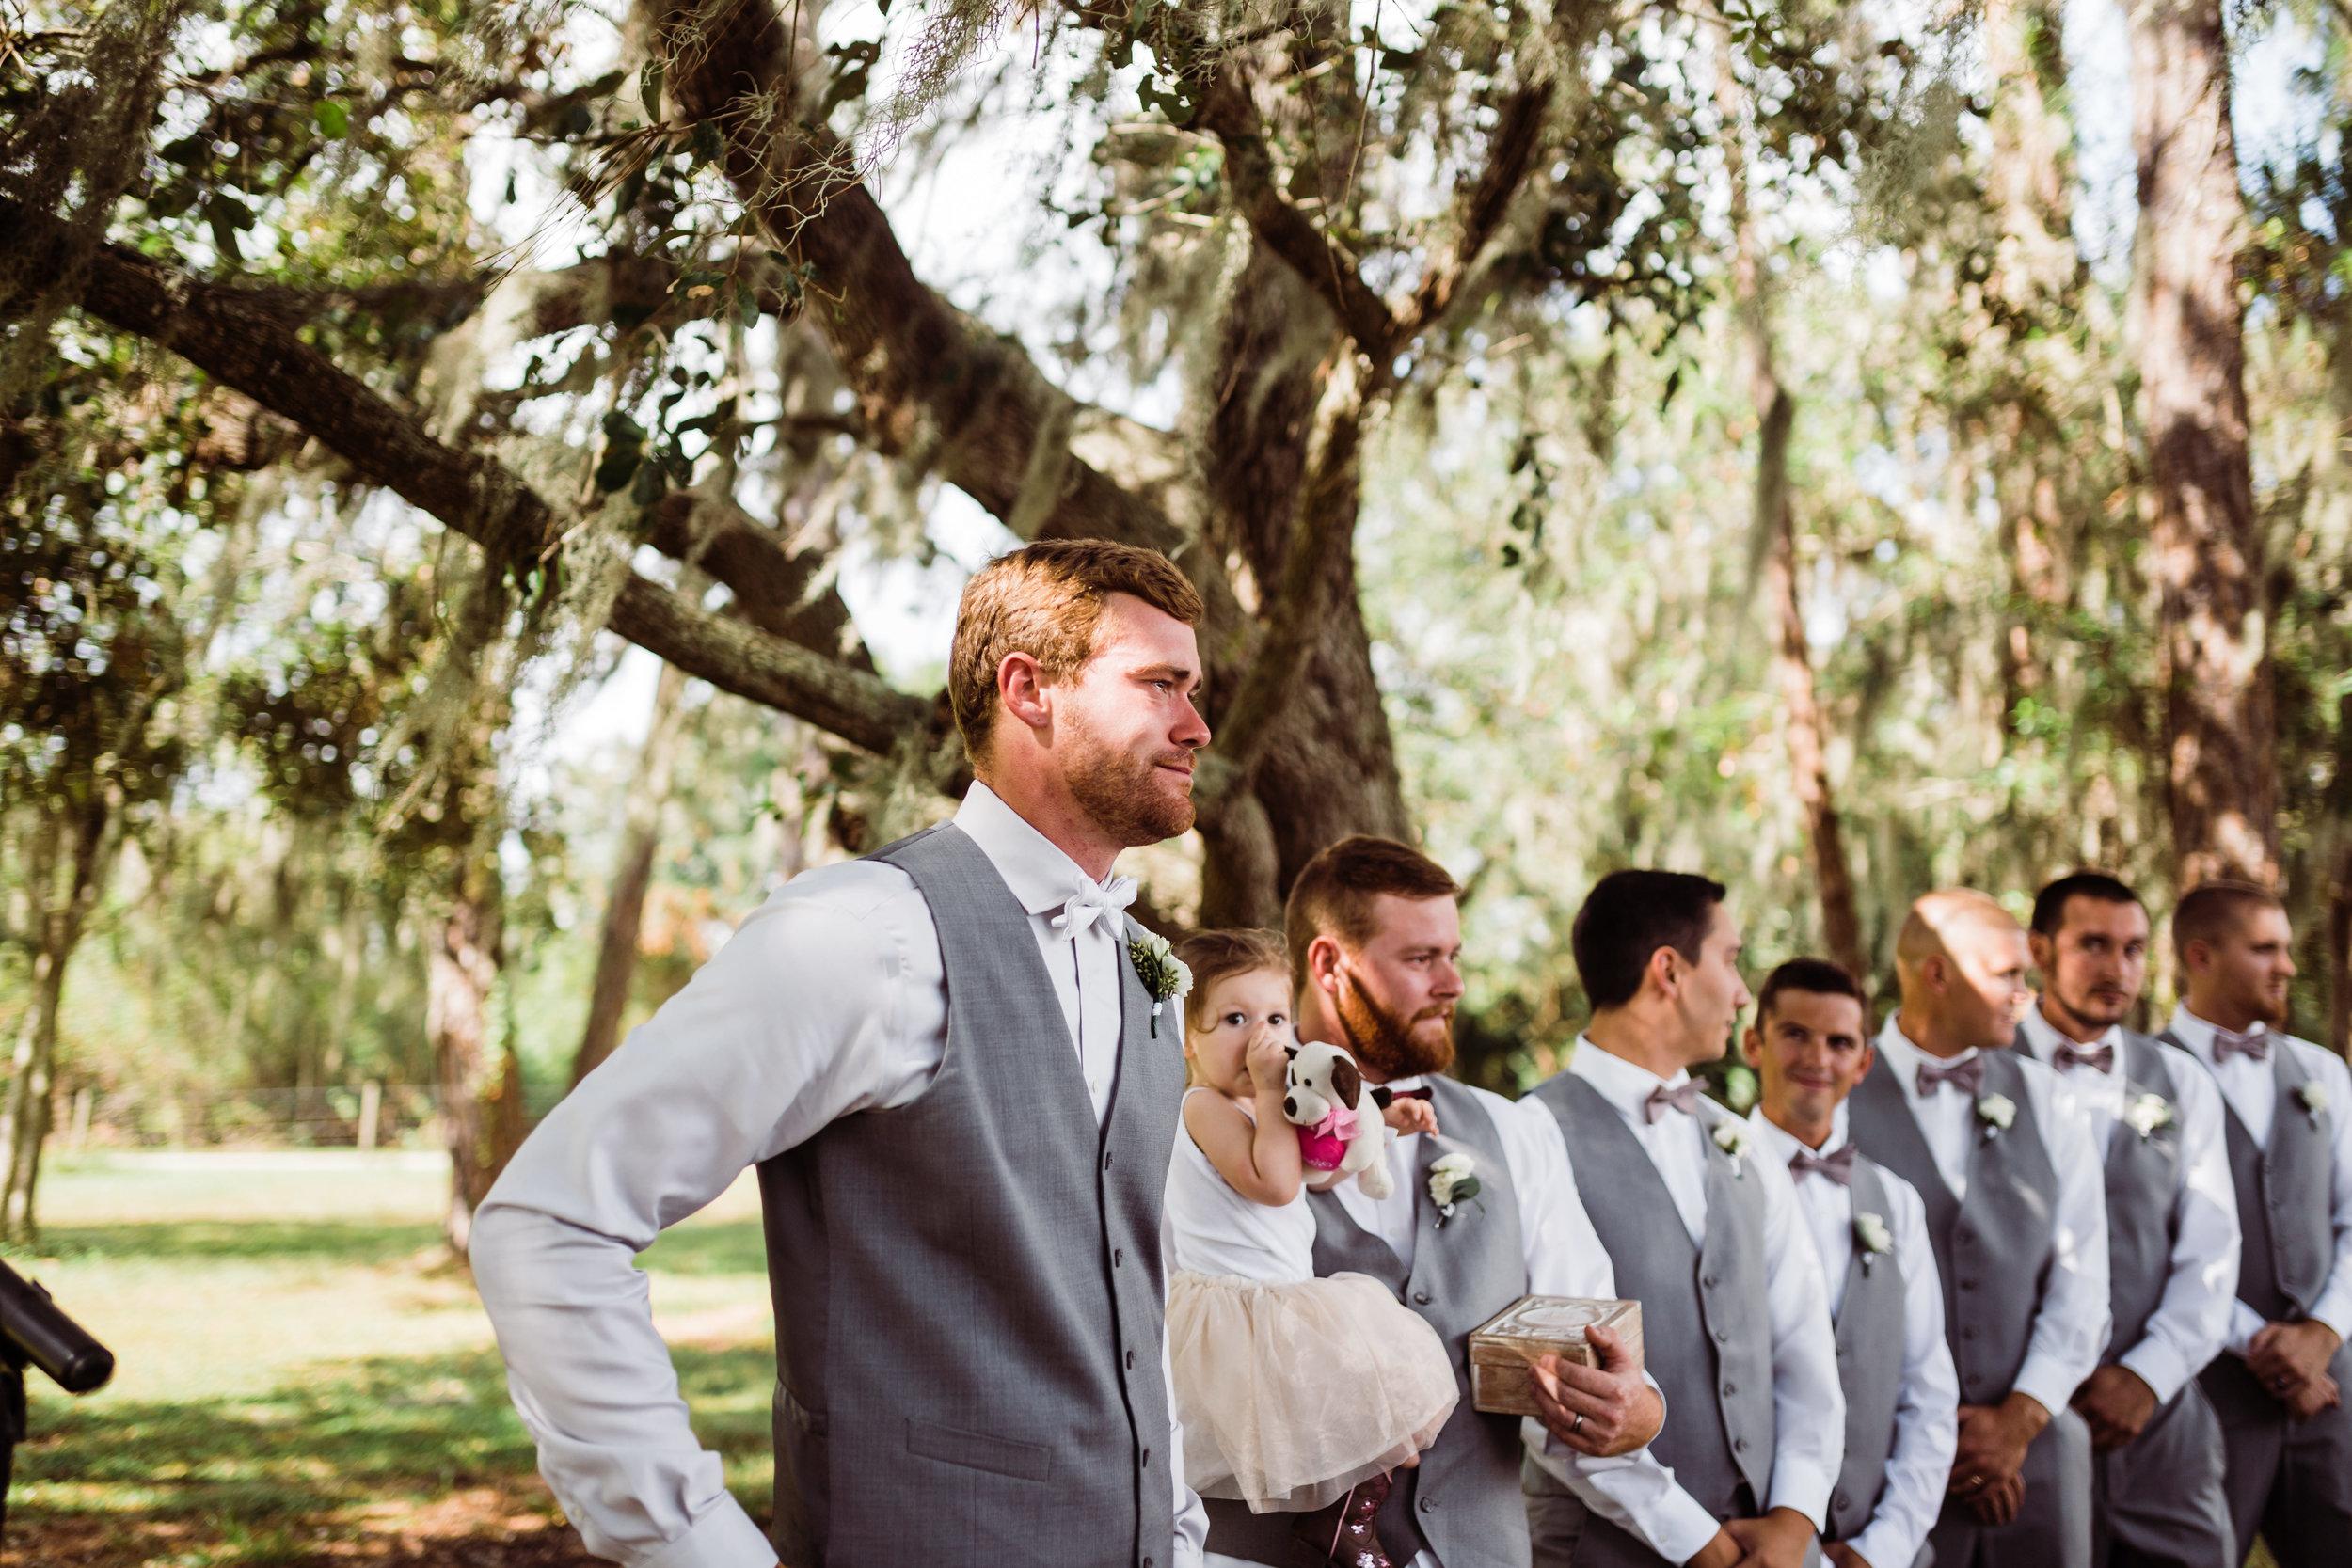 2017.10.14 Samantha and Matthew Crabtree Sarasota Wedding (128 of 708).jpg